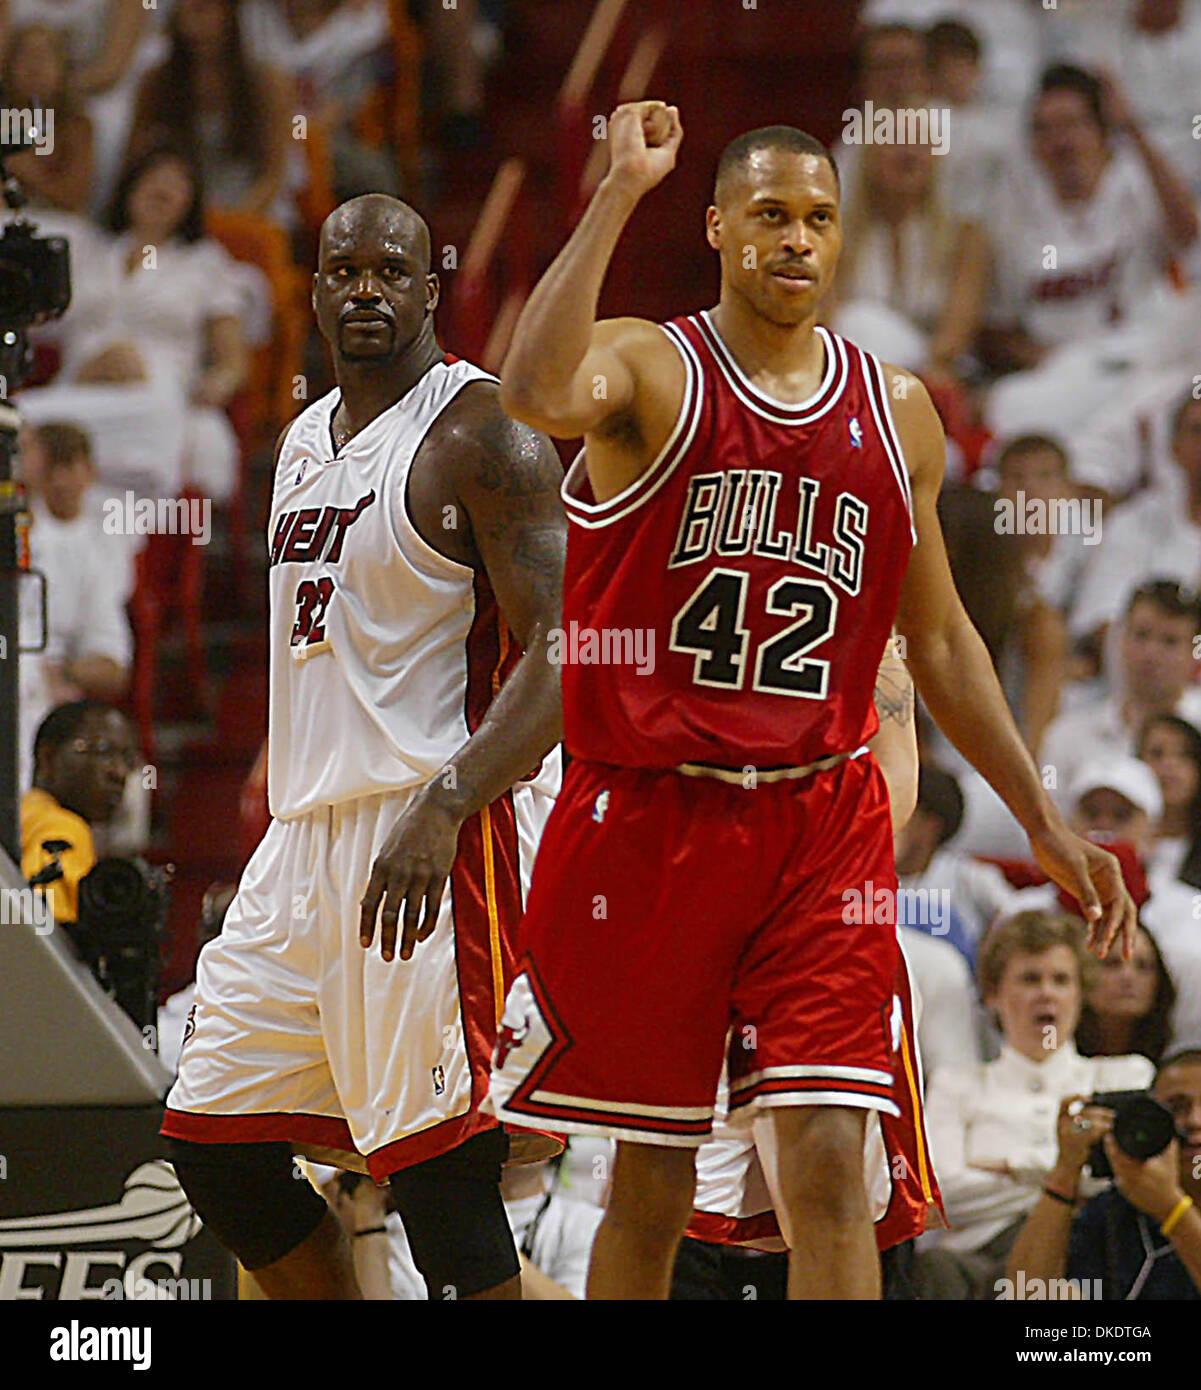 Apr 29 2007 Miami FL USA The Bulls P J BROWN celebrates